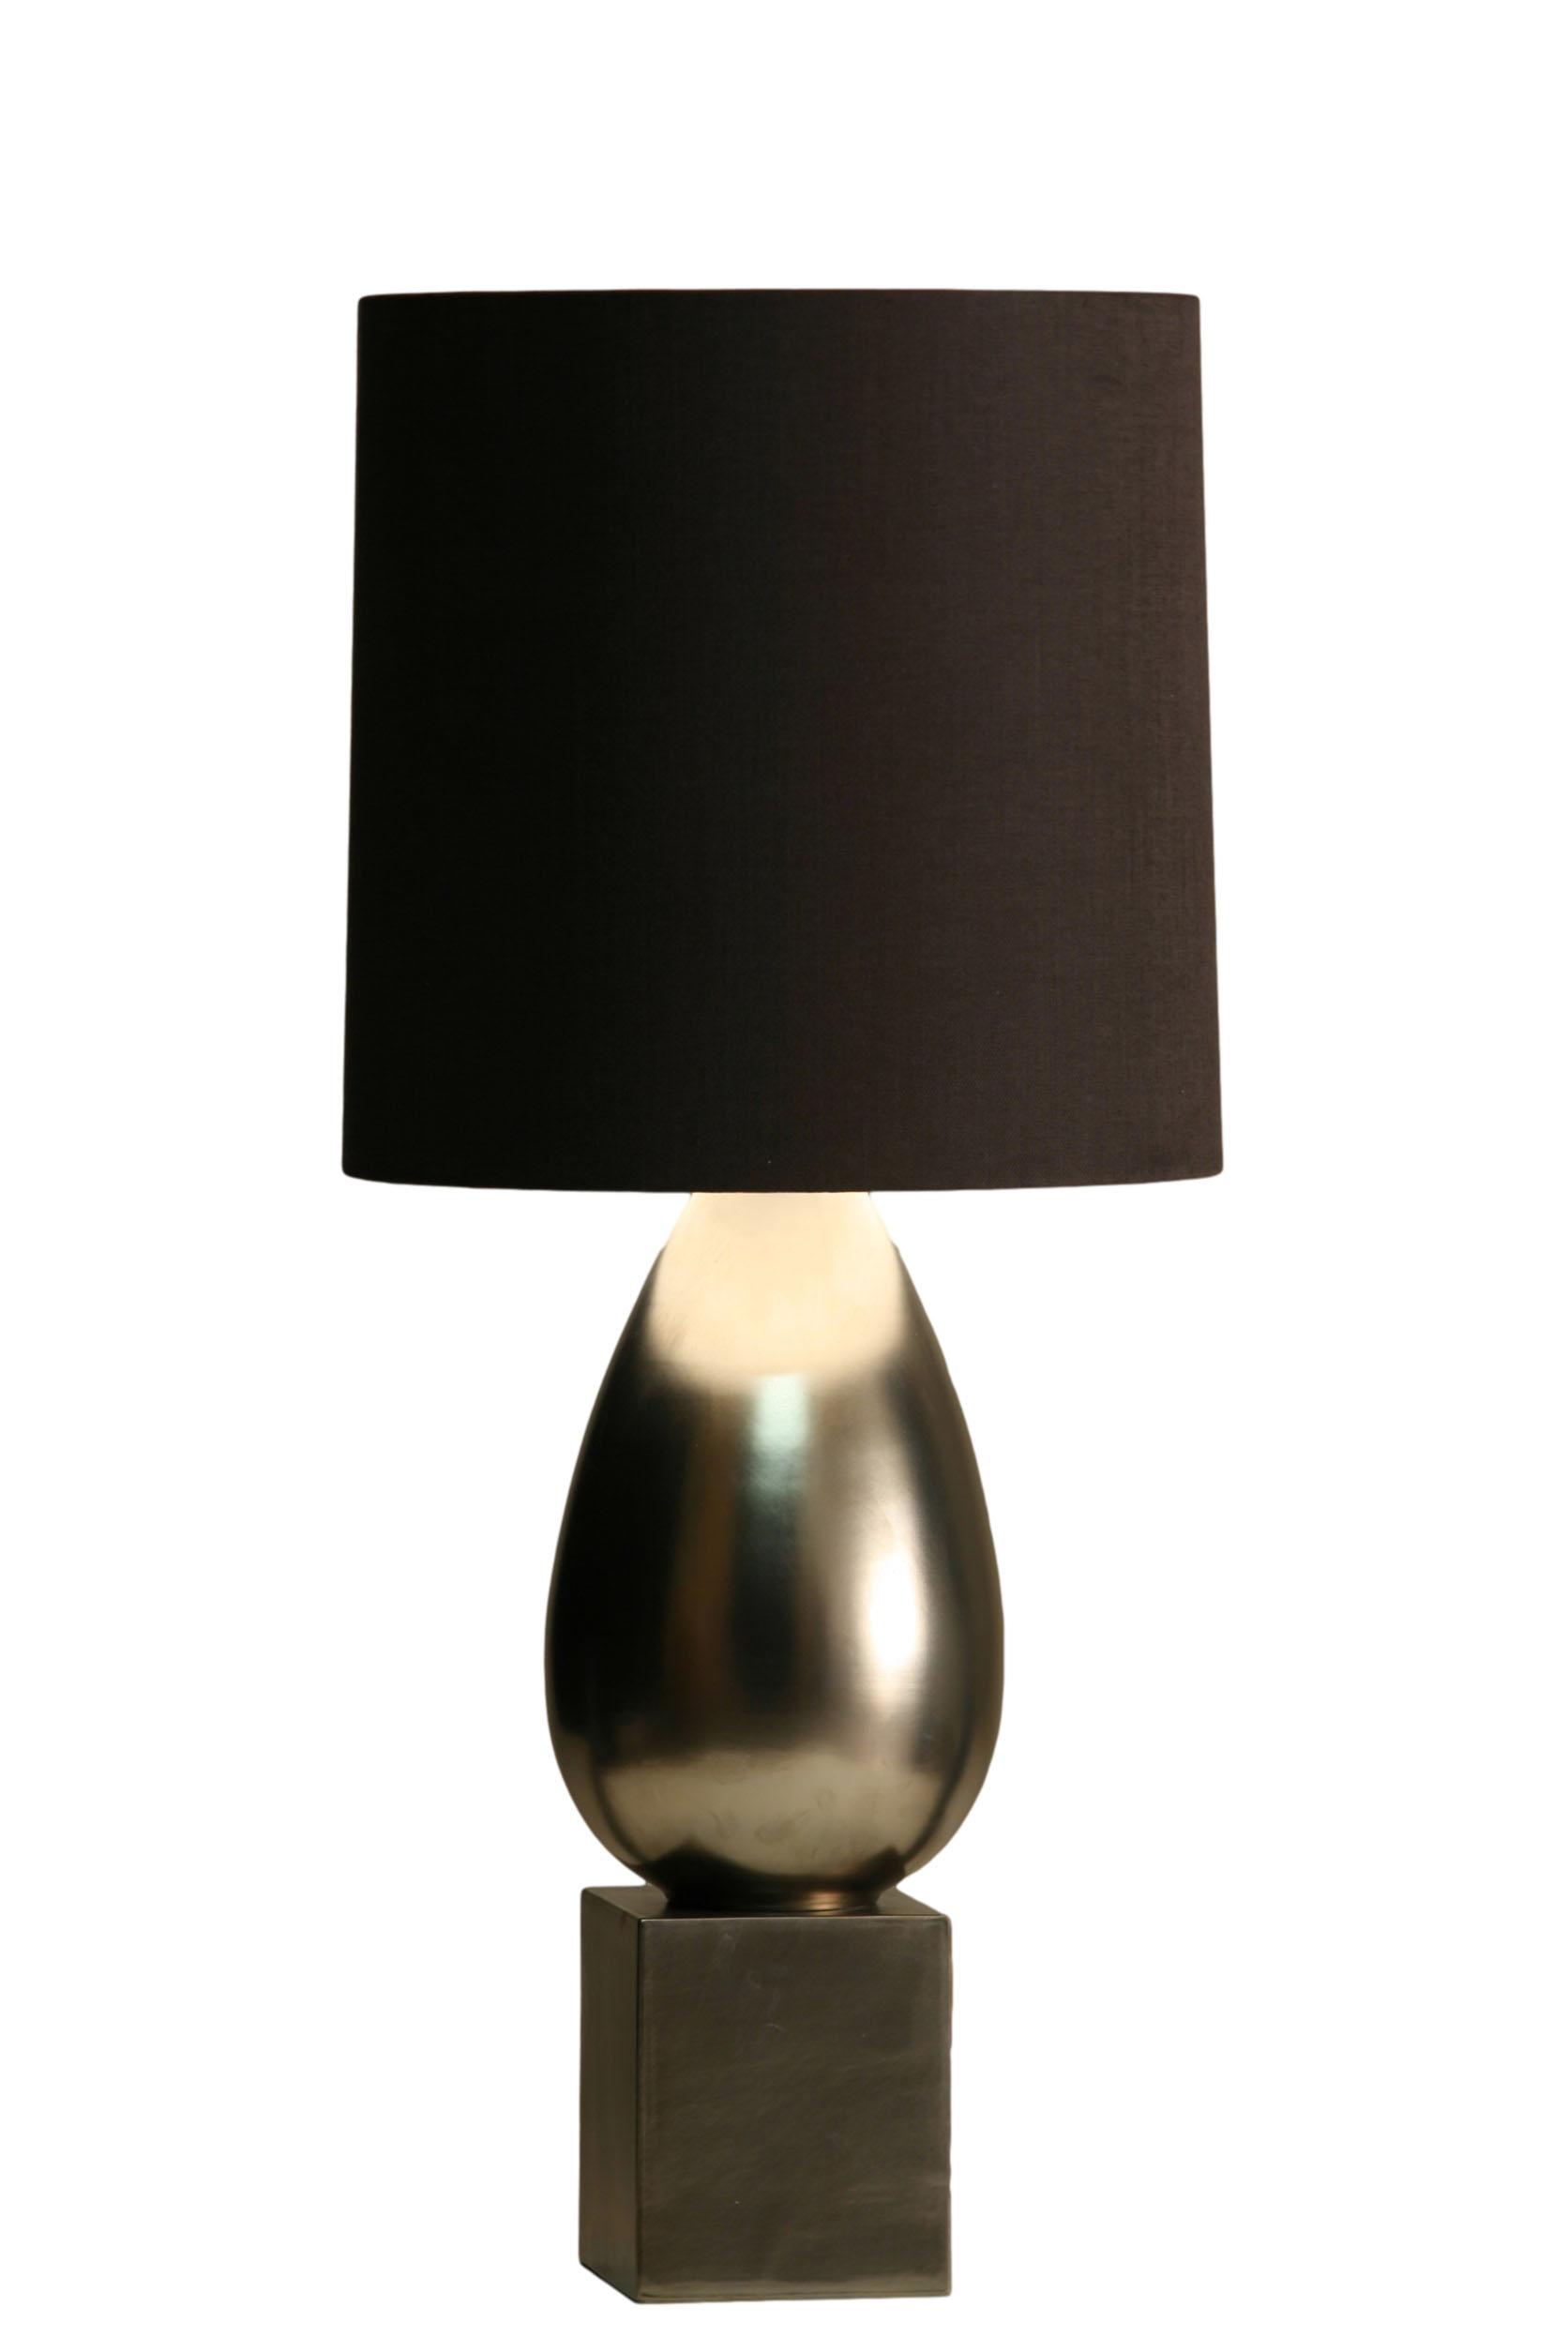 Stout Verlichting Collectie Sfeerfoto Tafellamp Dalí